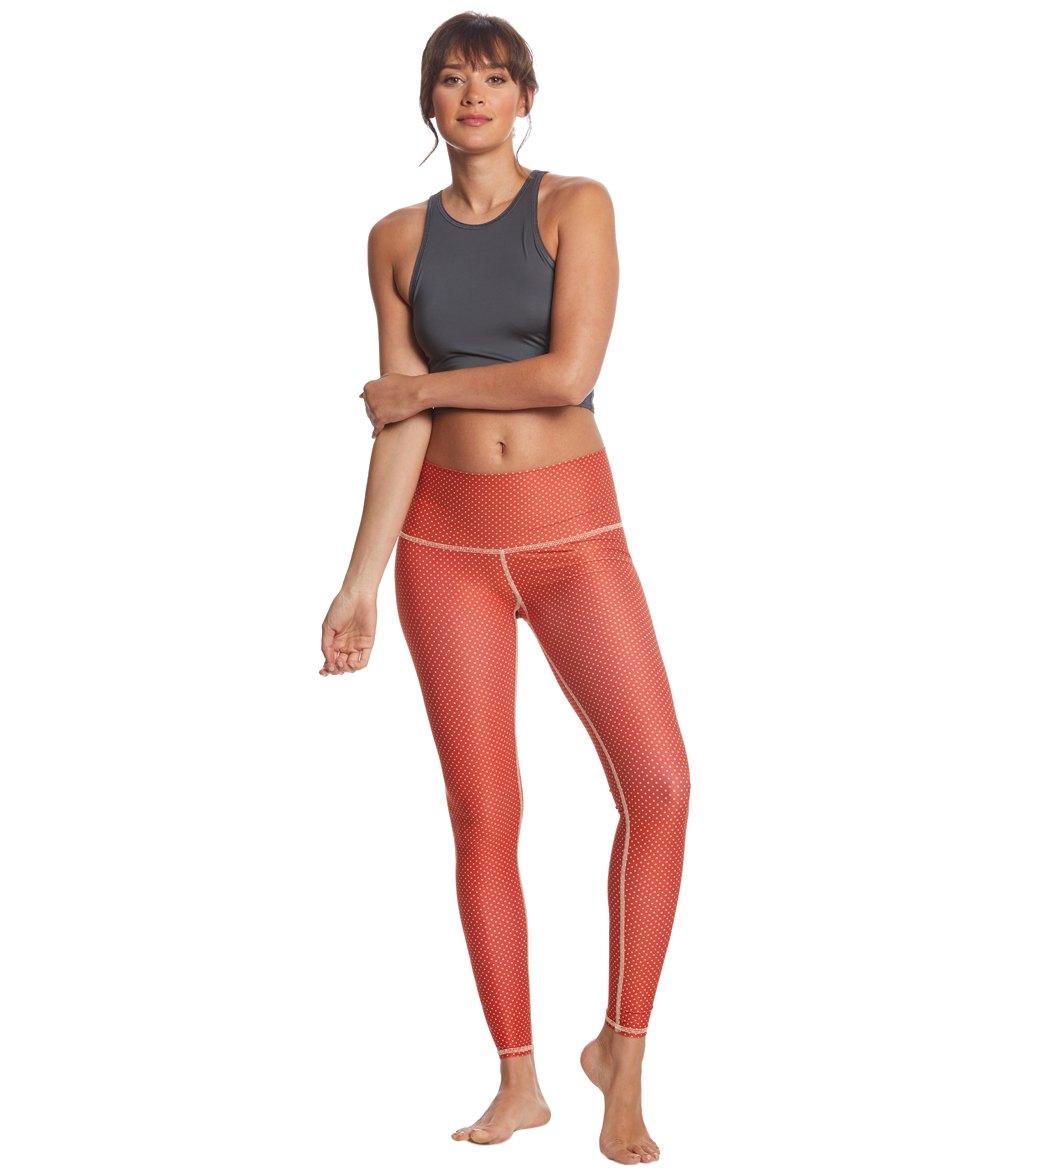 d3eaa2ea086485 Teeki Polka Dot Cowgirl Red Hot Yoga Pants at YogaOutlet.com - Free ...